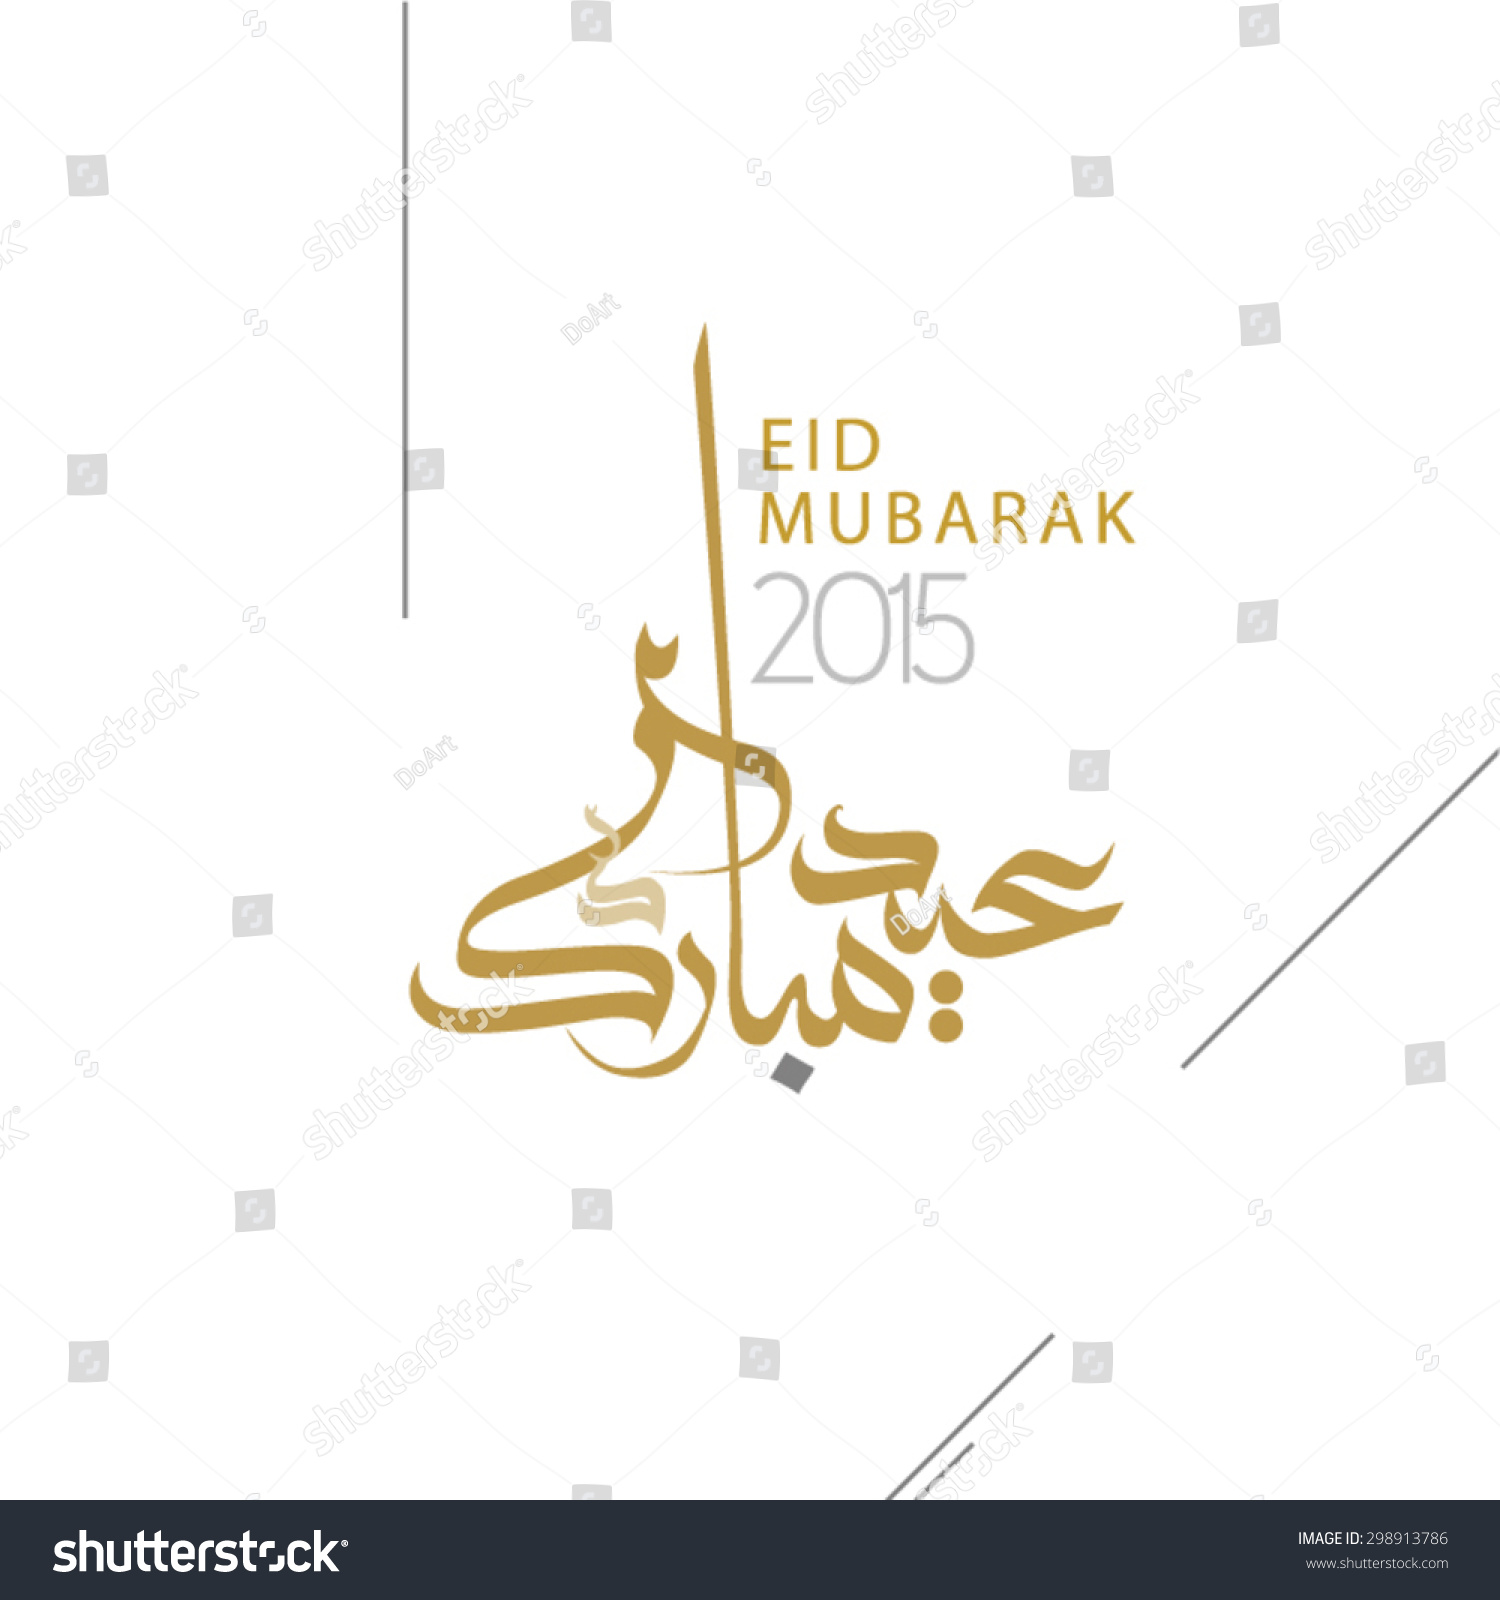 Eid Mubarak Greeting Card Arabic Calligraphy Stock Vector Royalty